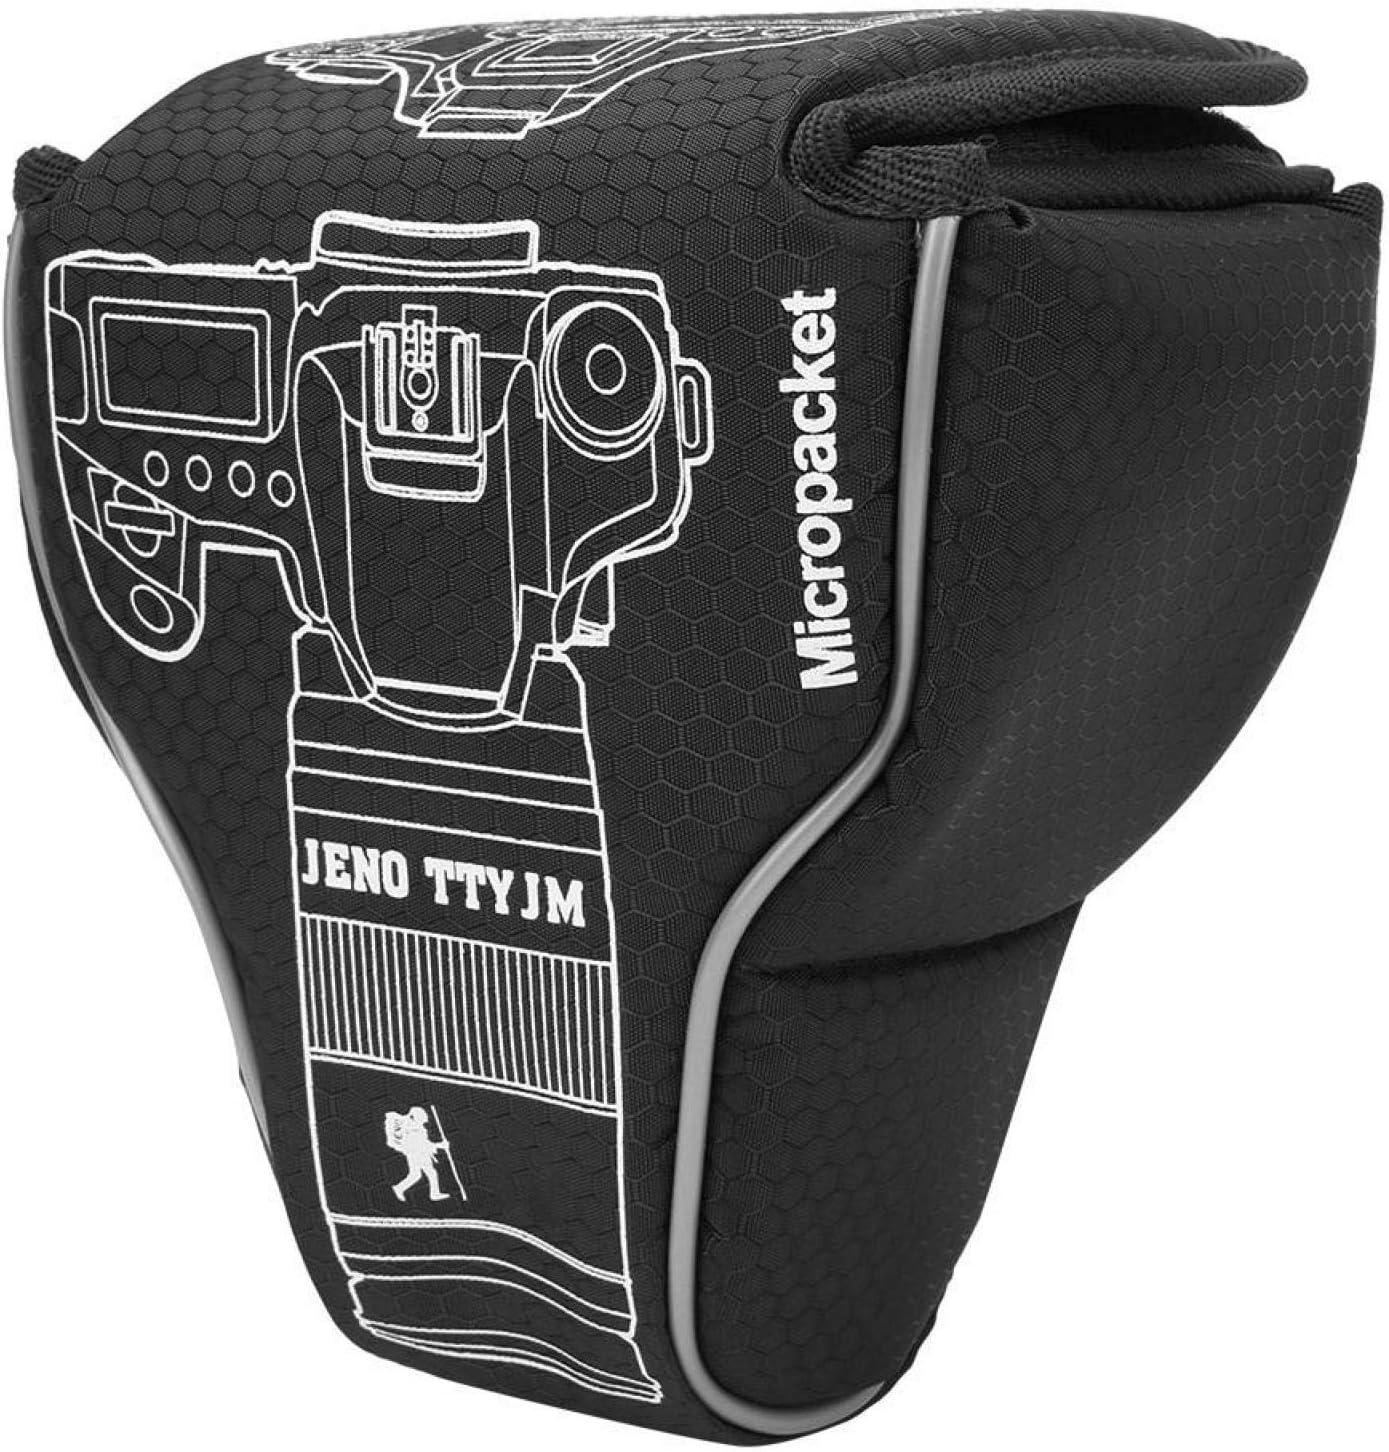 Zyyini Regular dealer Camera Discount mail order Storage Bag Universal Nylon Waterproof Hol